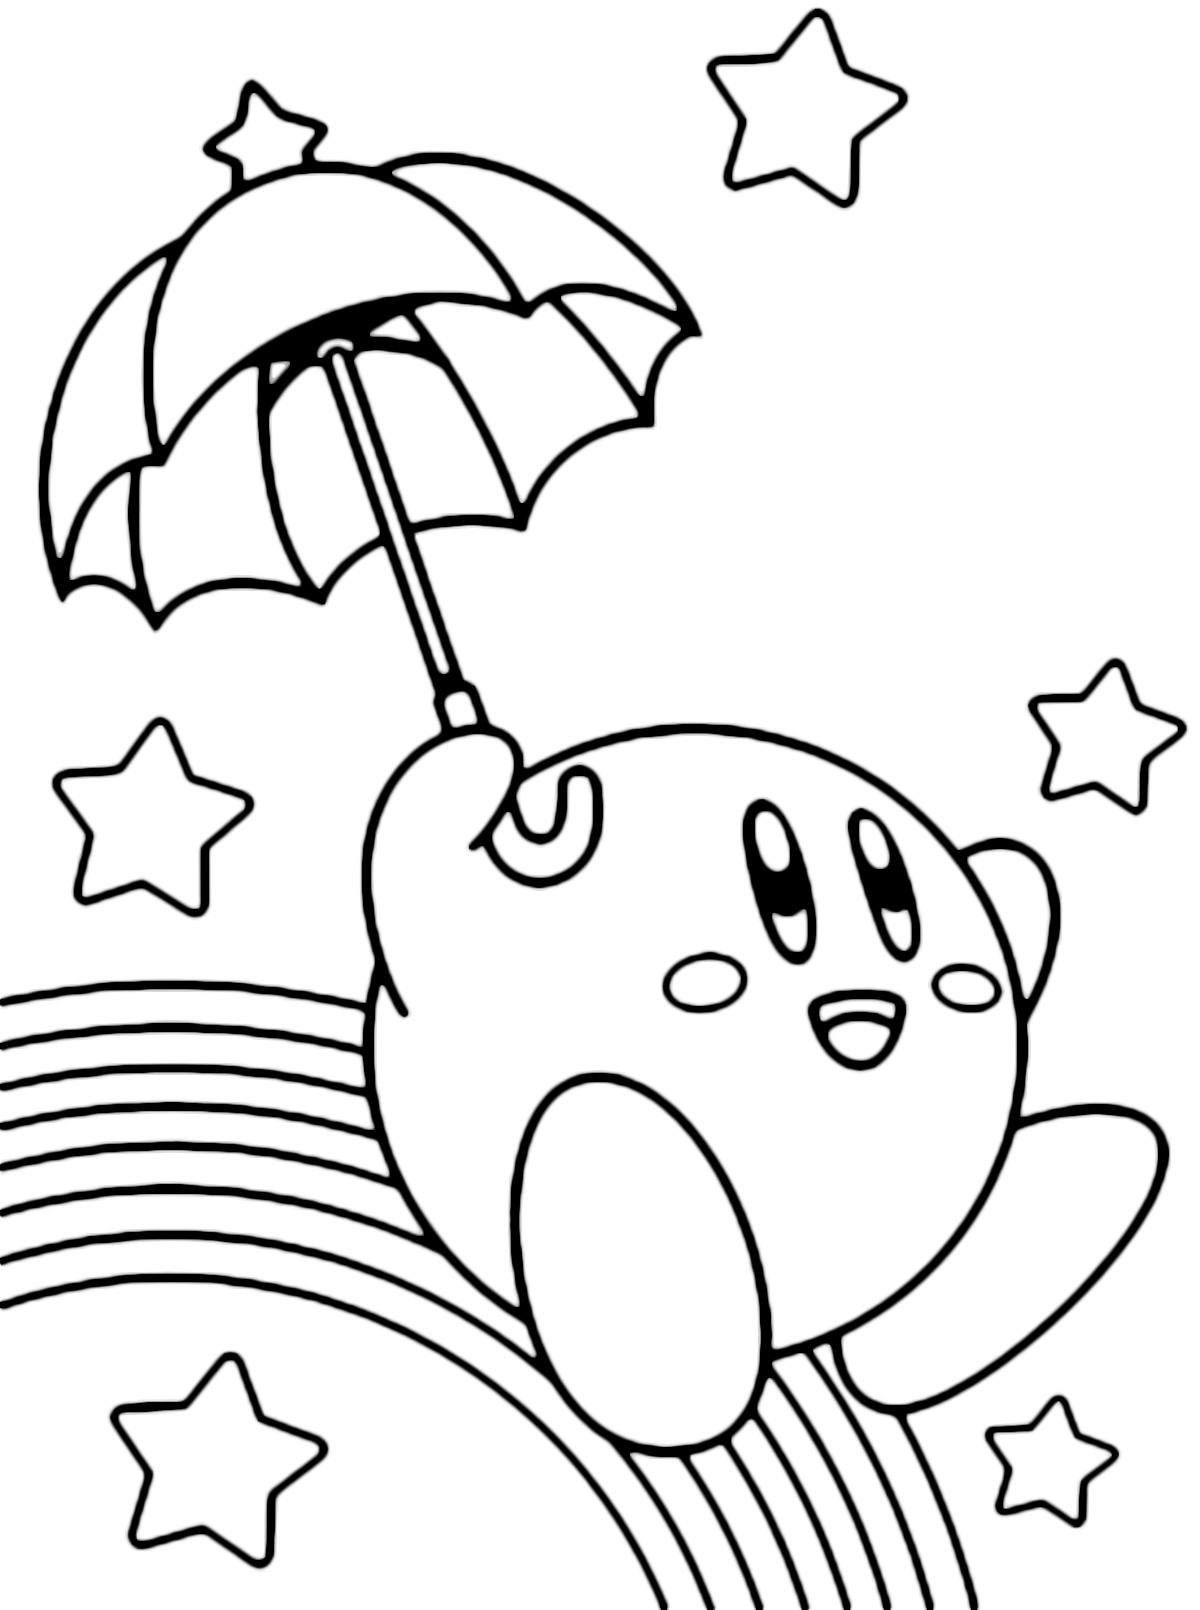 Kirby Kleurplaten Printen.Kleurplaat Nintendo Switch Malvorlagen Fur Kinder Ausmalbilder